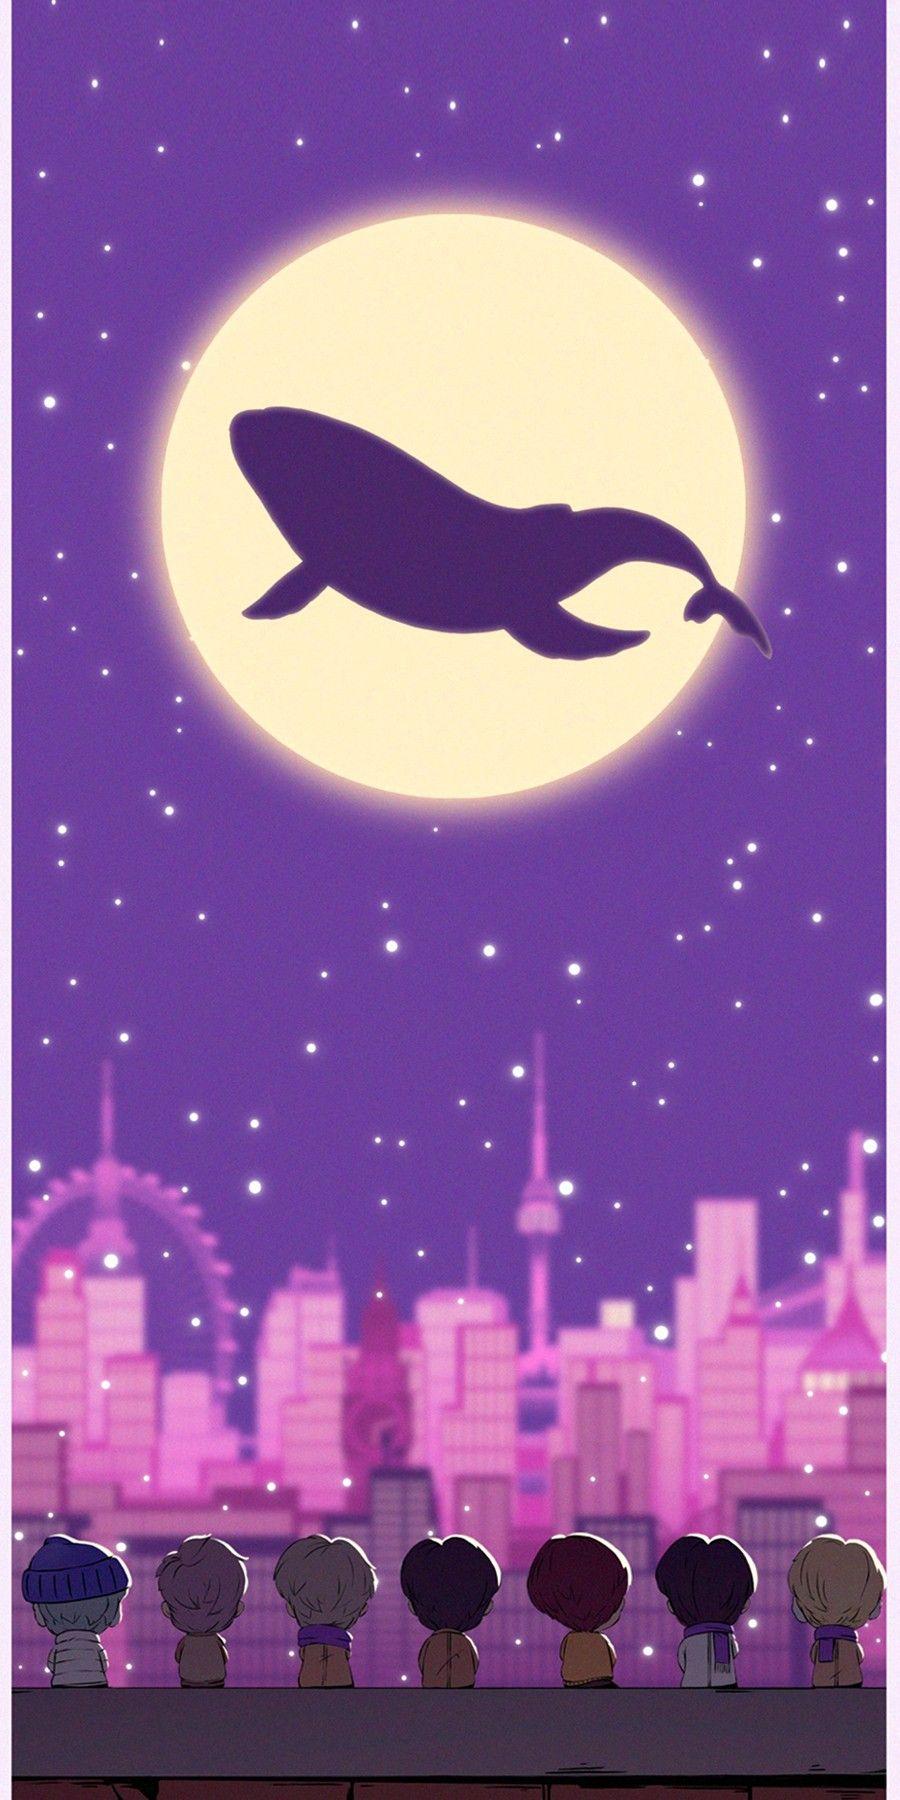 Whalien Tiny Tan Dream On Wallpaper In 2021 Bts Wallpaper Bts Drawings Wallpaper Bts purple whale wallpaper